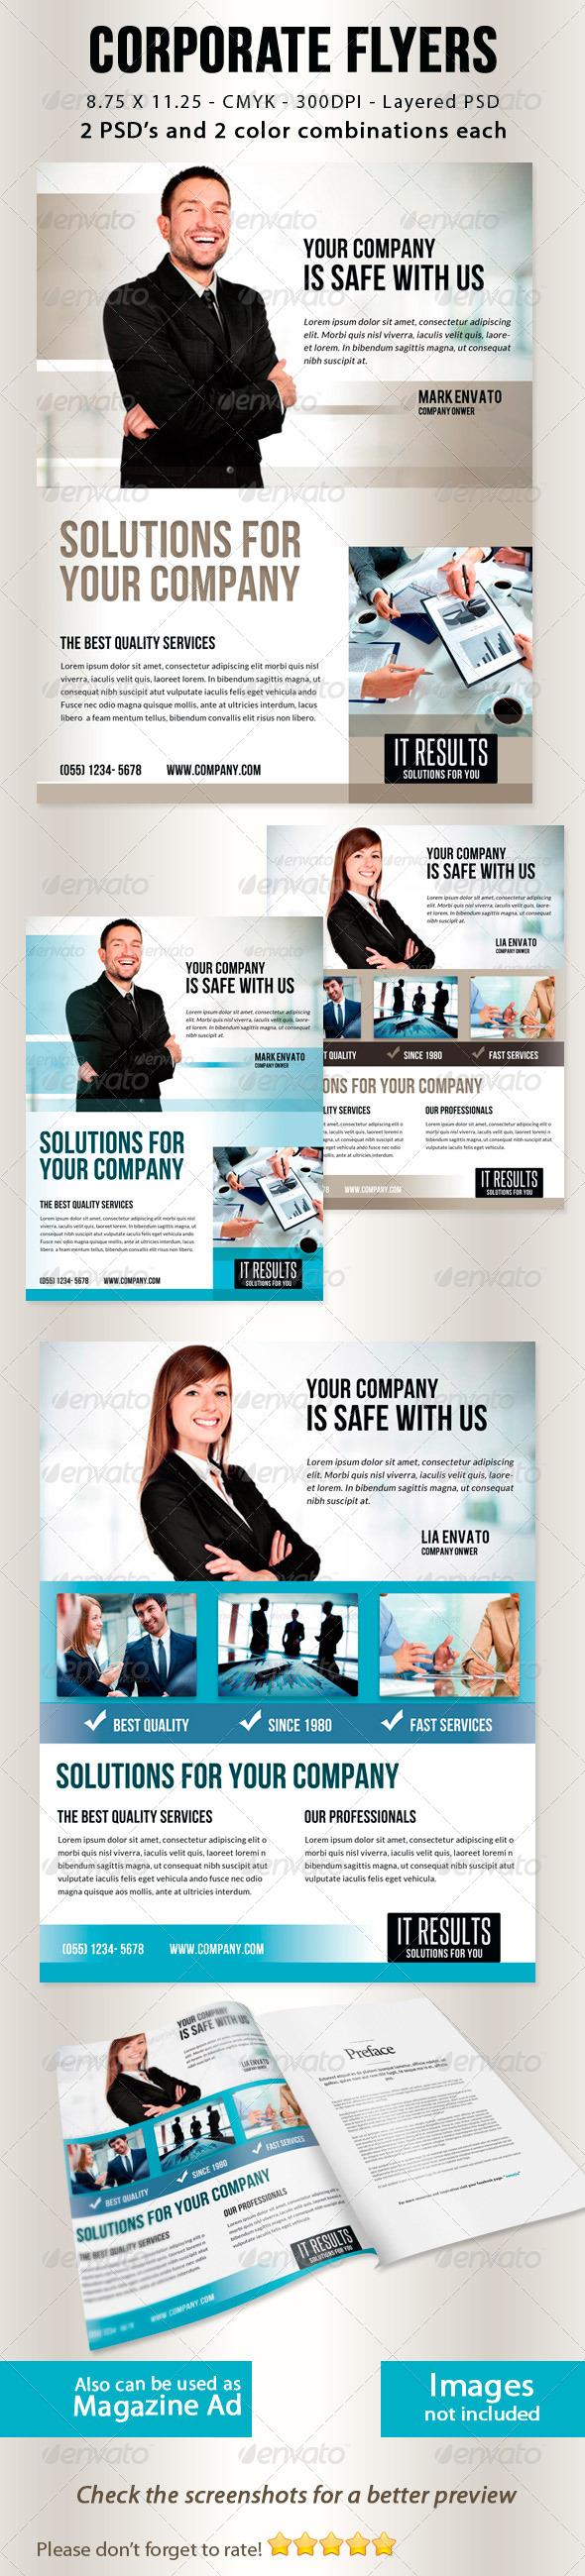 GraphicRiver Corporate Flyers vol 1 5542498